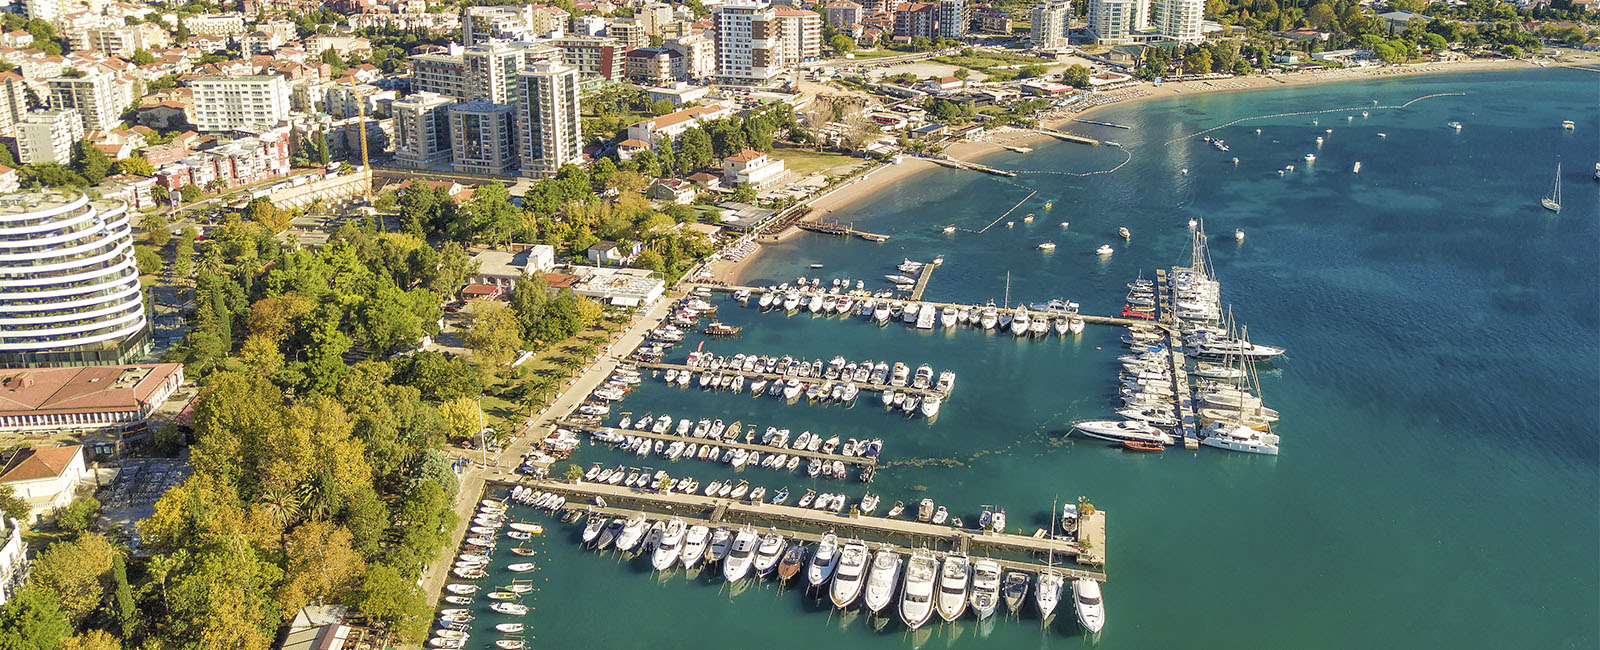 Budva - Aerial View of Montenegro - Savory & Partners - Dubai, UAE